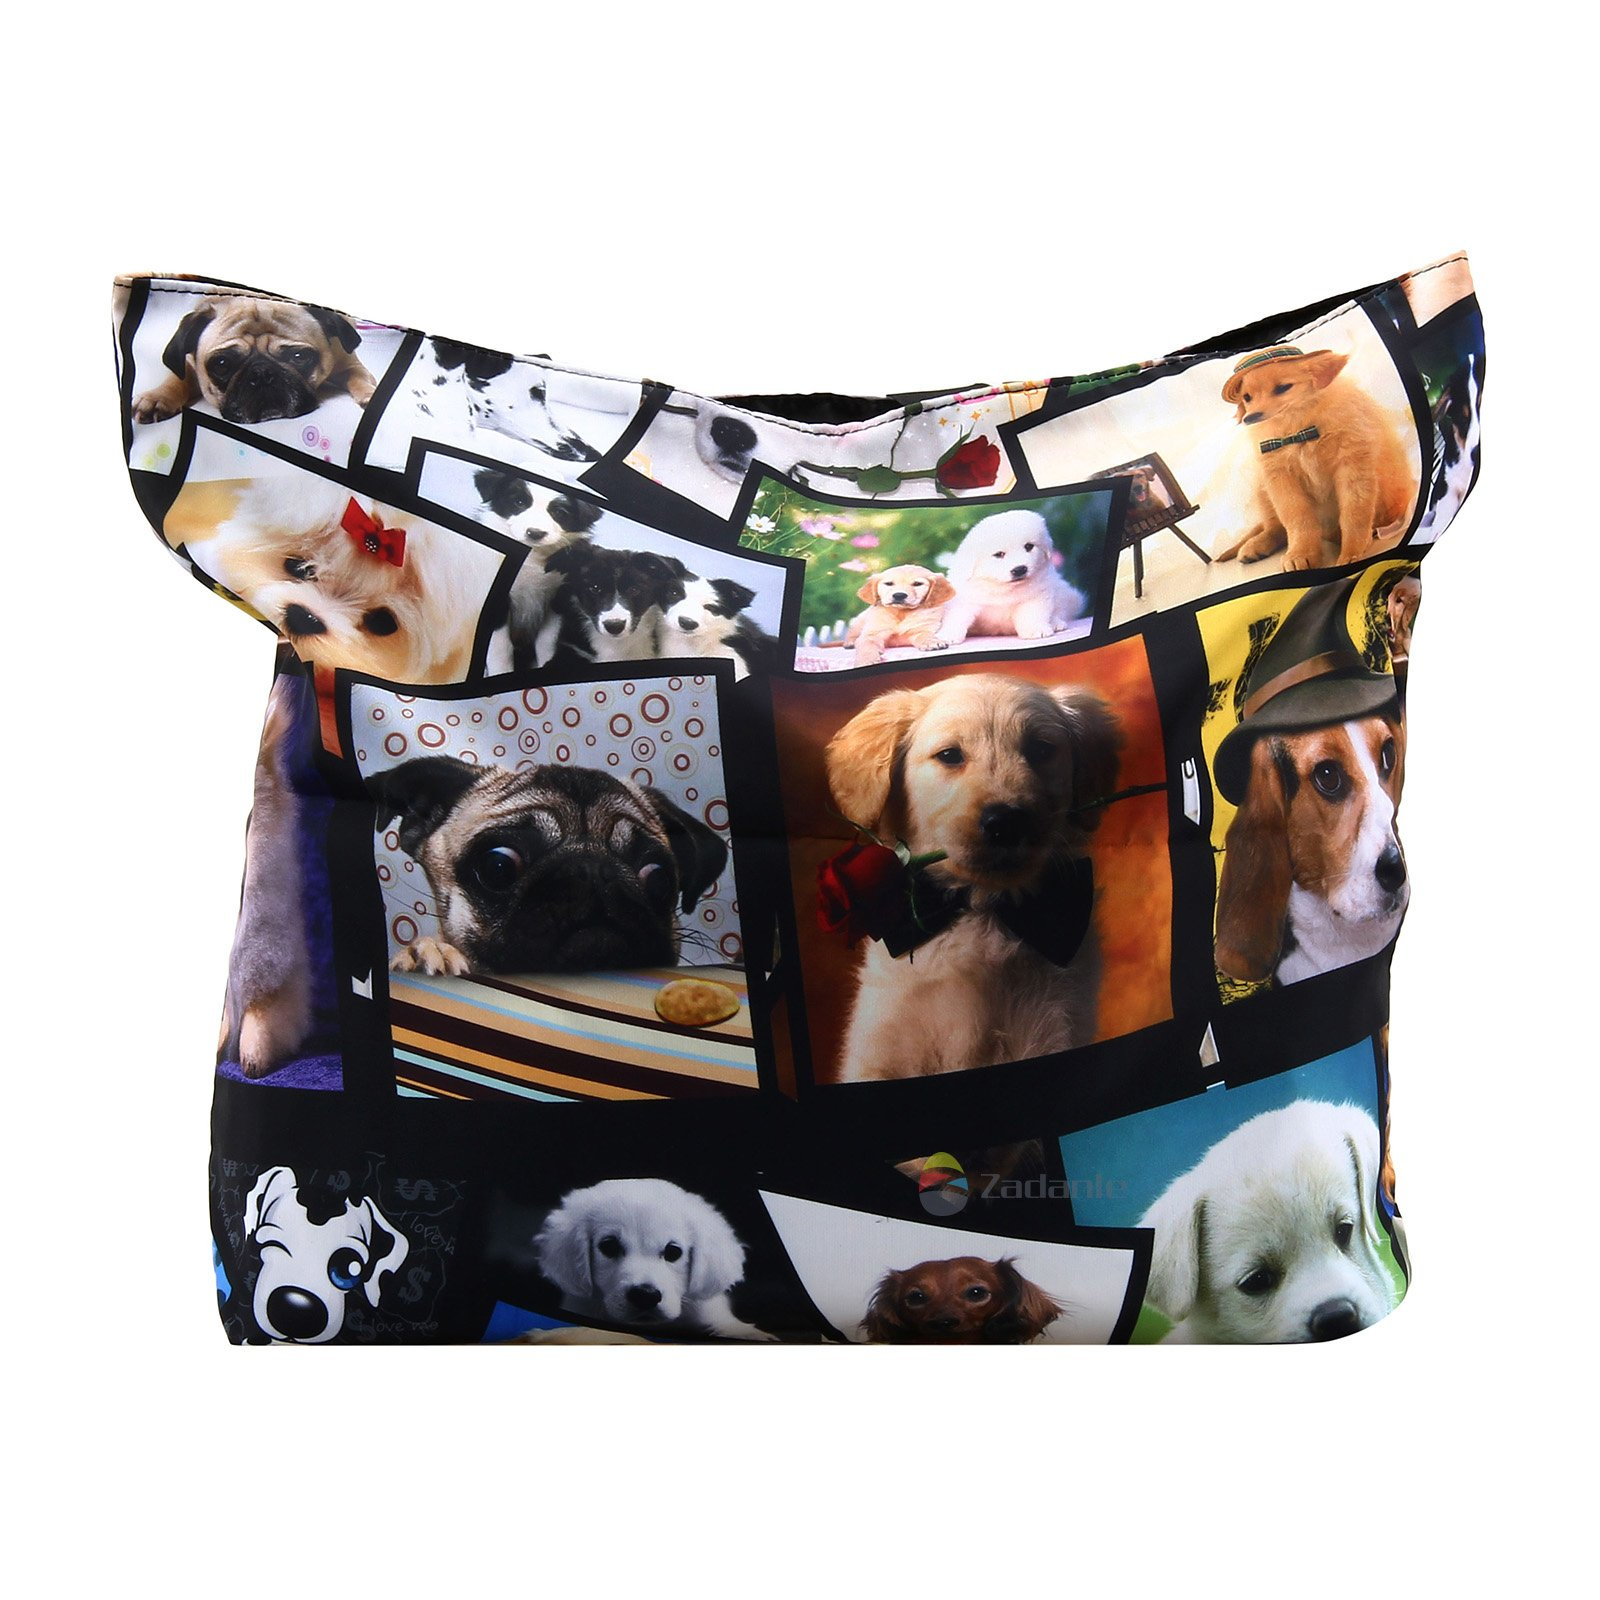 Newplenty Ladies Zippered Light Shoulder Shopping Tote Bag Handbag Beach Satchel, Many Dogs by newplenty (Image #2)